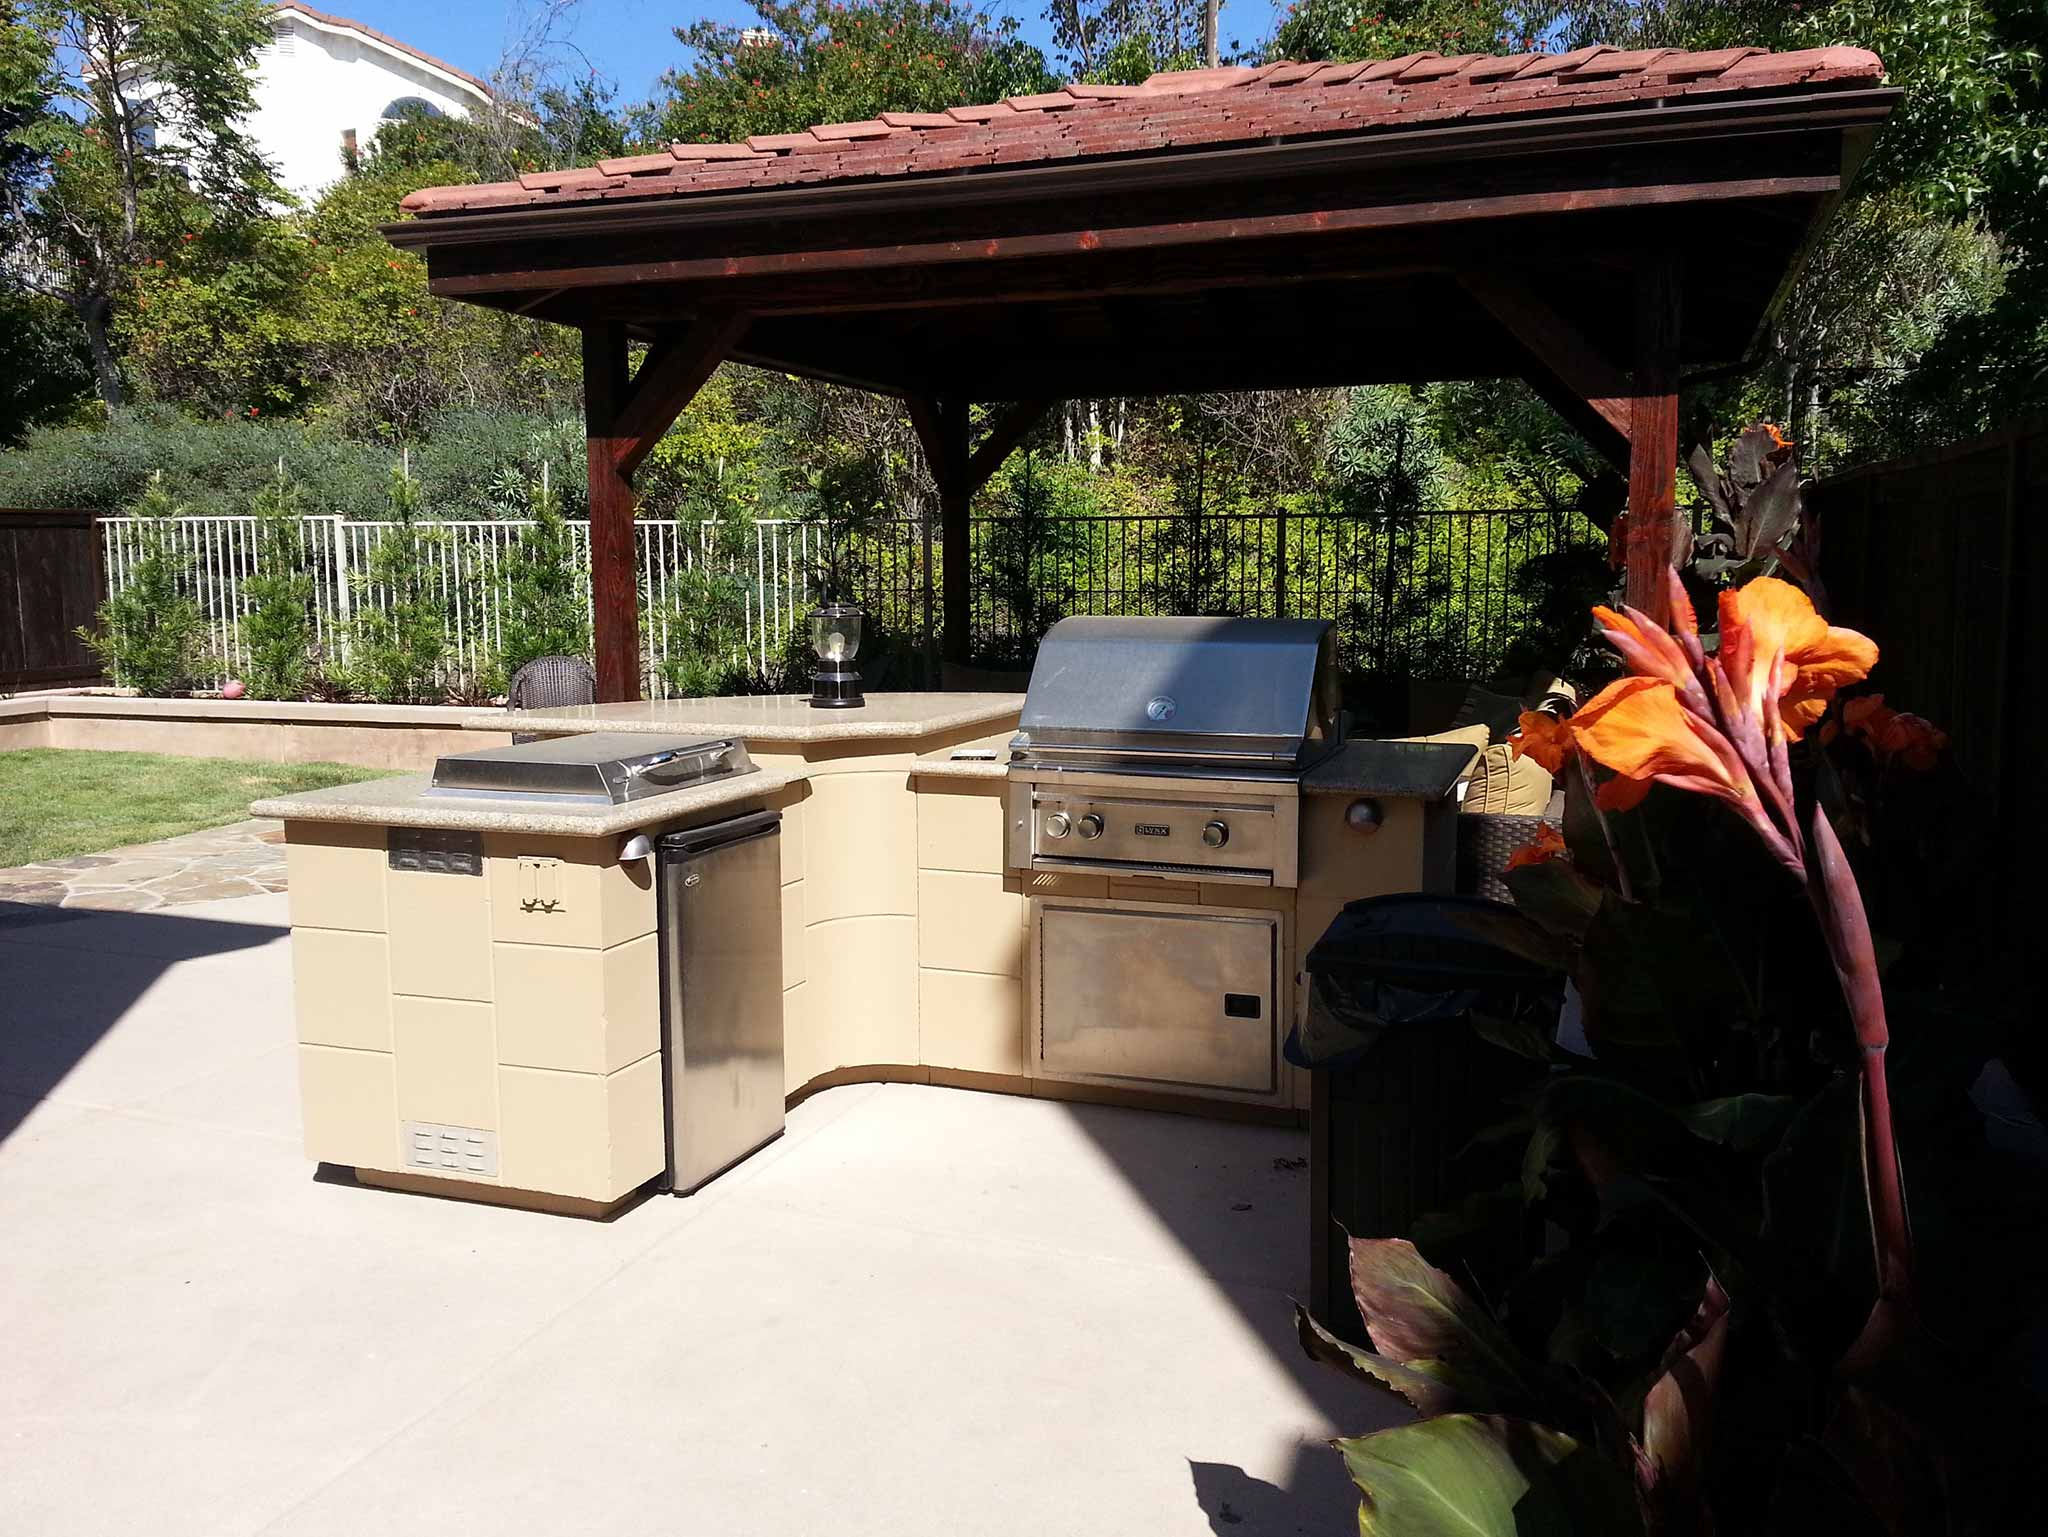 Full view of concrete barbecue area